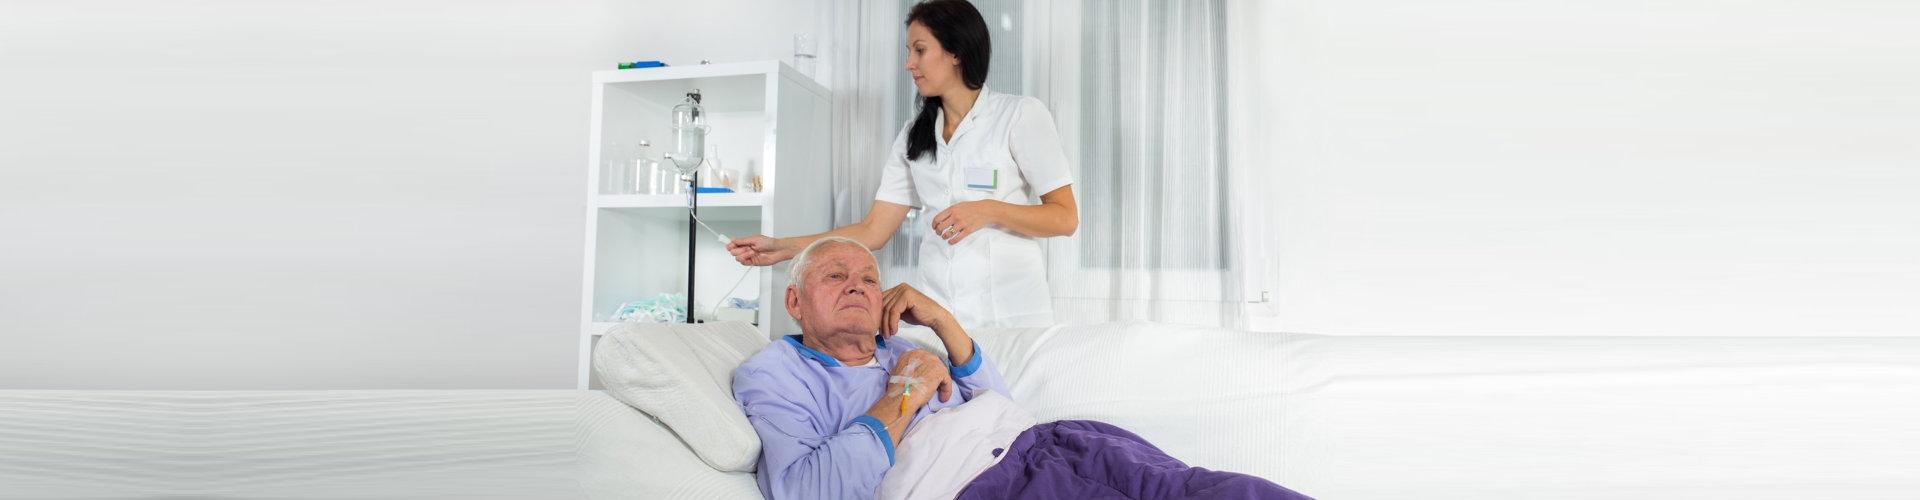 an elderly patient with a nurse